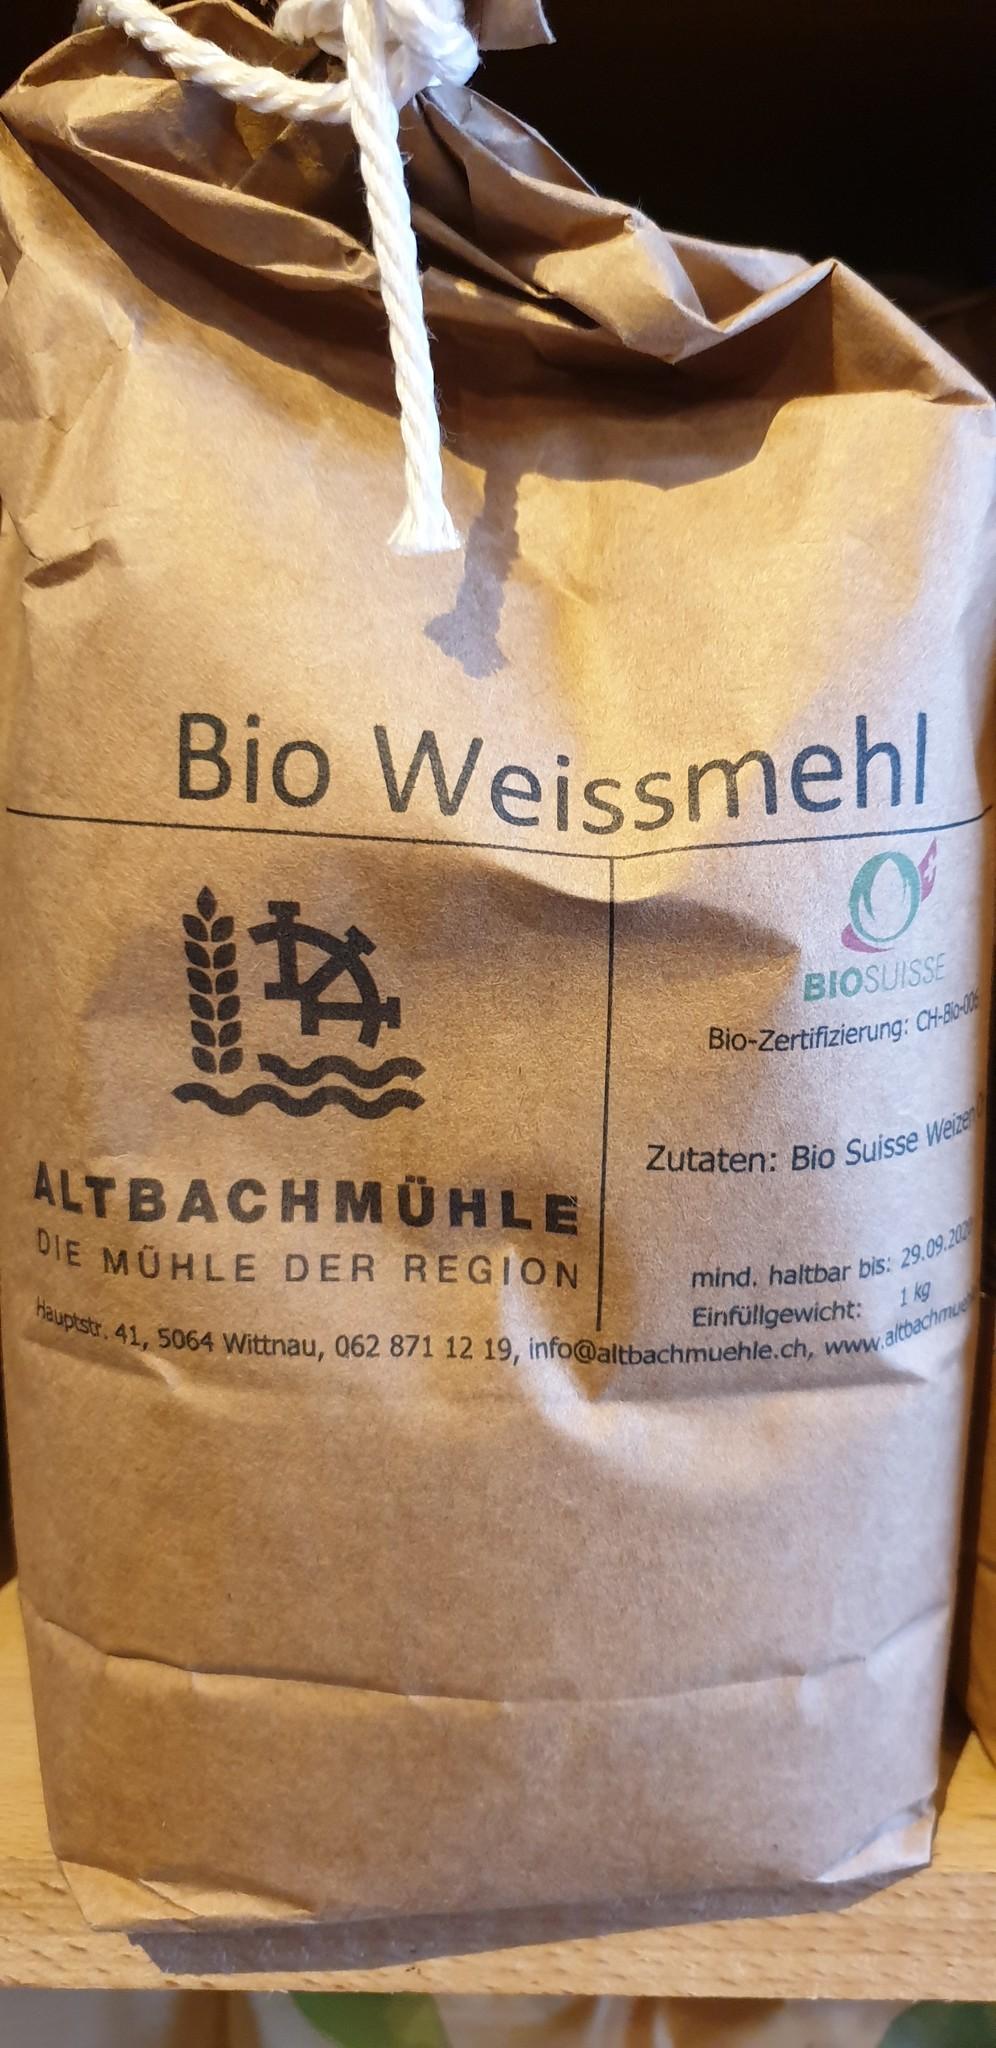 Altbachmühle Weissmehl bio 1kg Altbachmühle